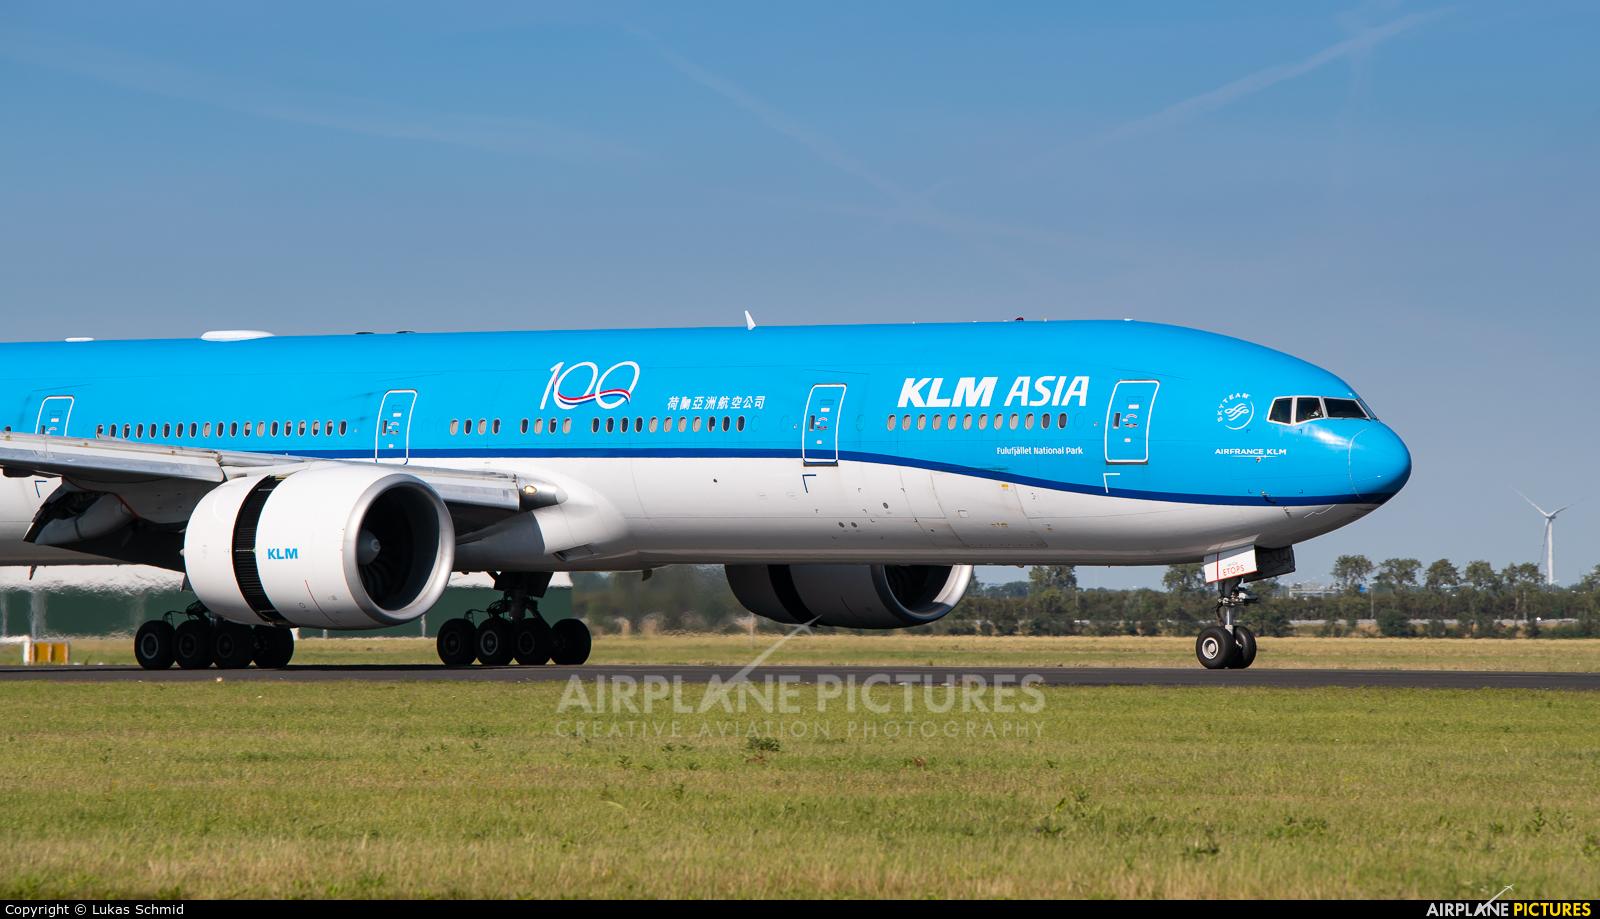 KLM Asia PH-BVB aircraft at Amsterdam - Schiphol